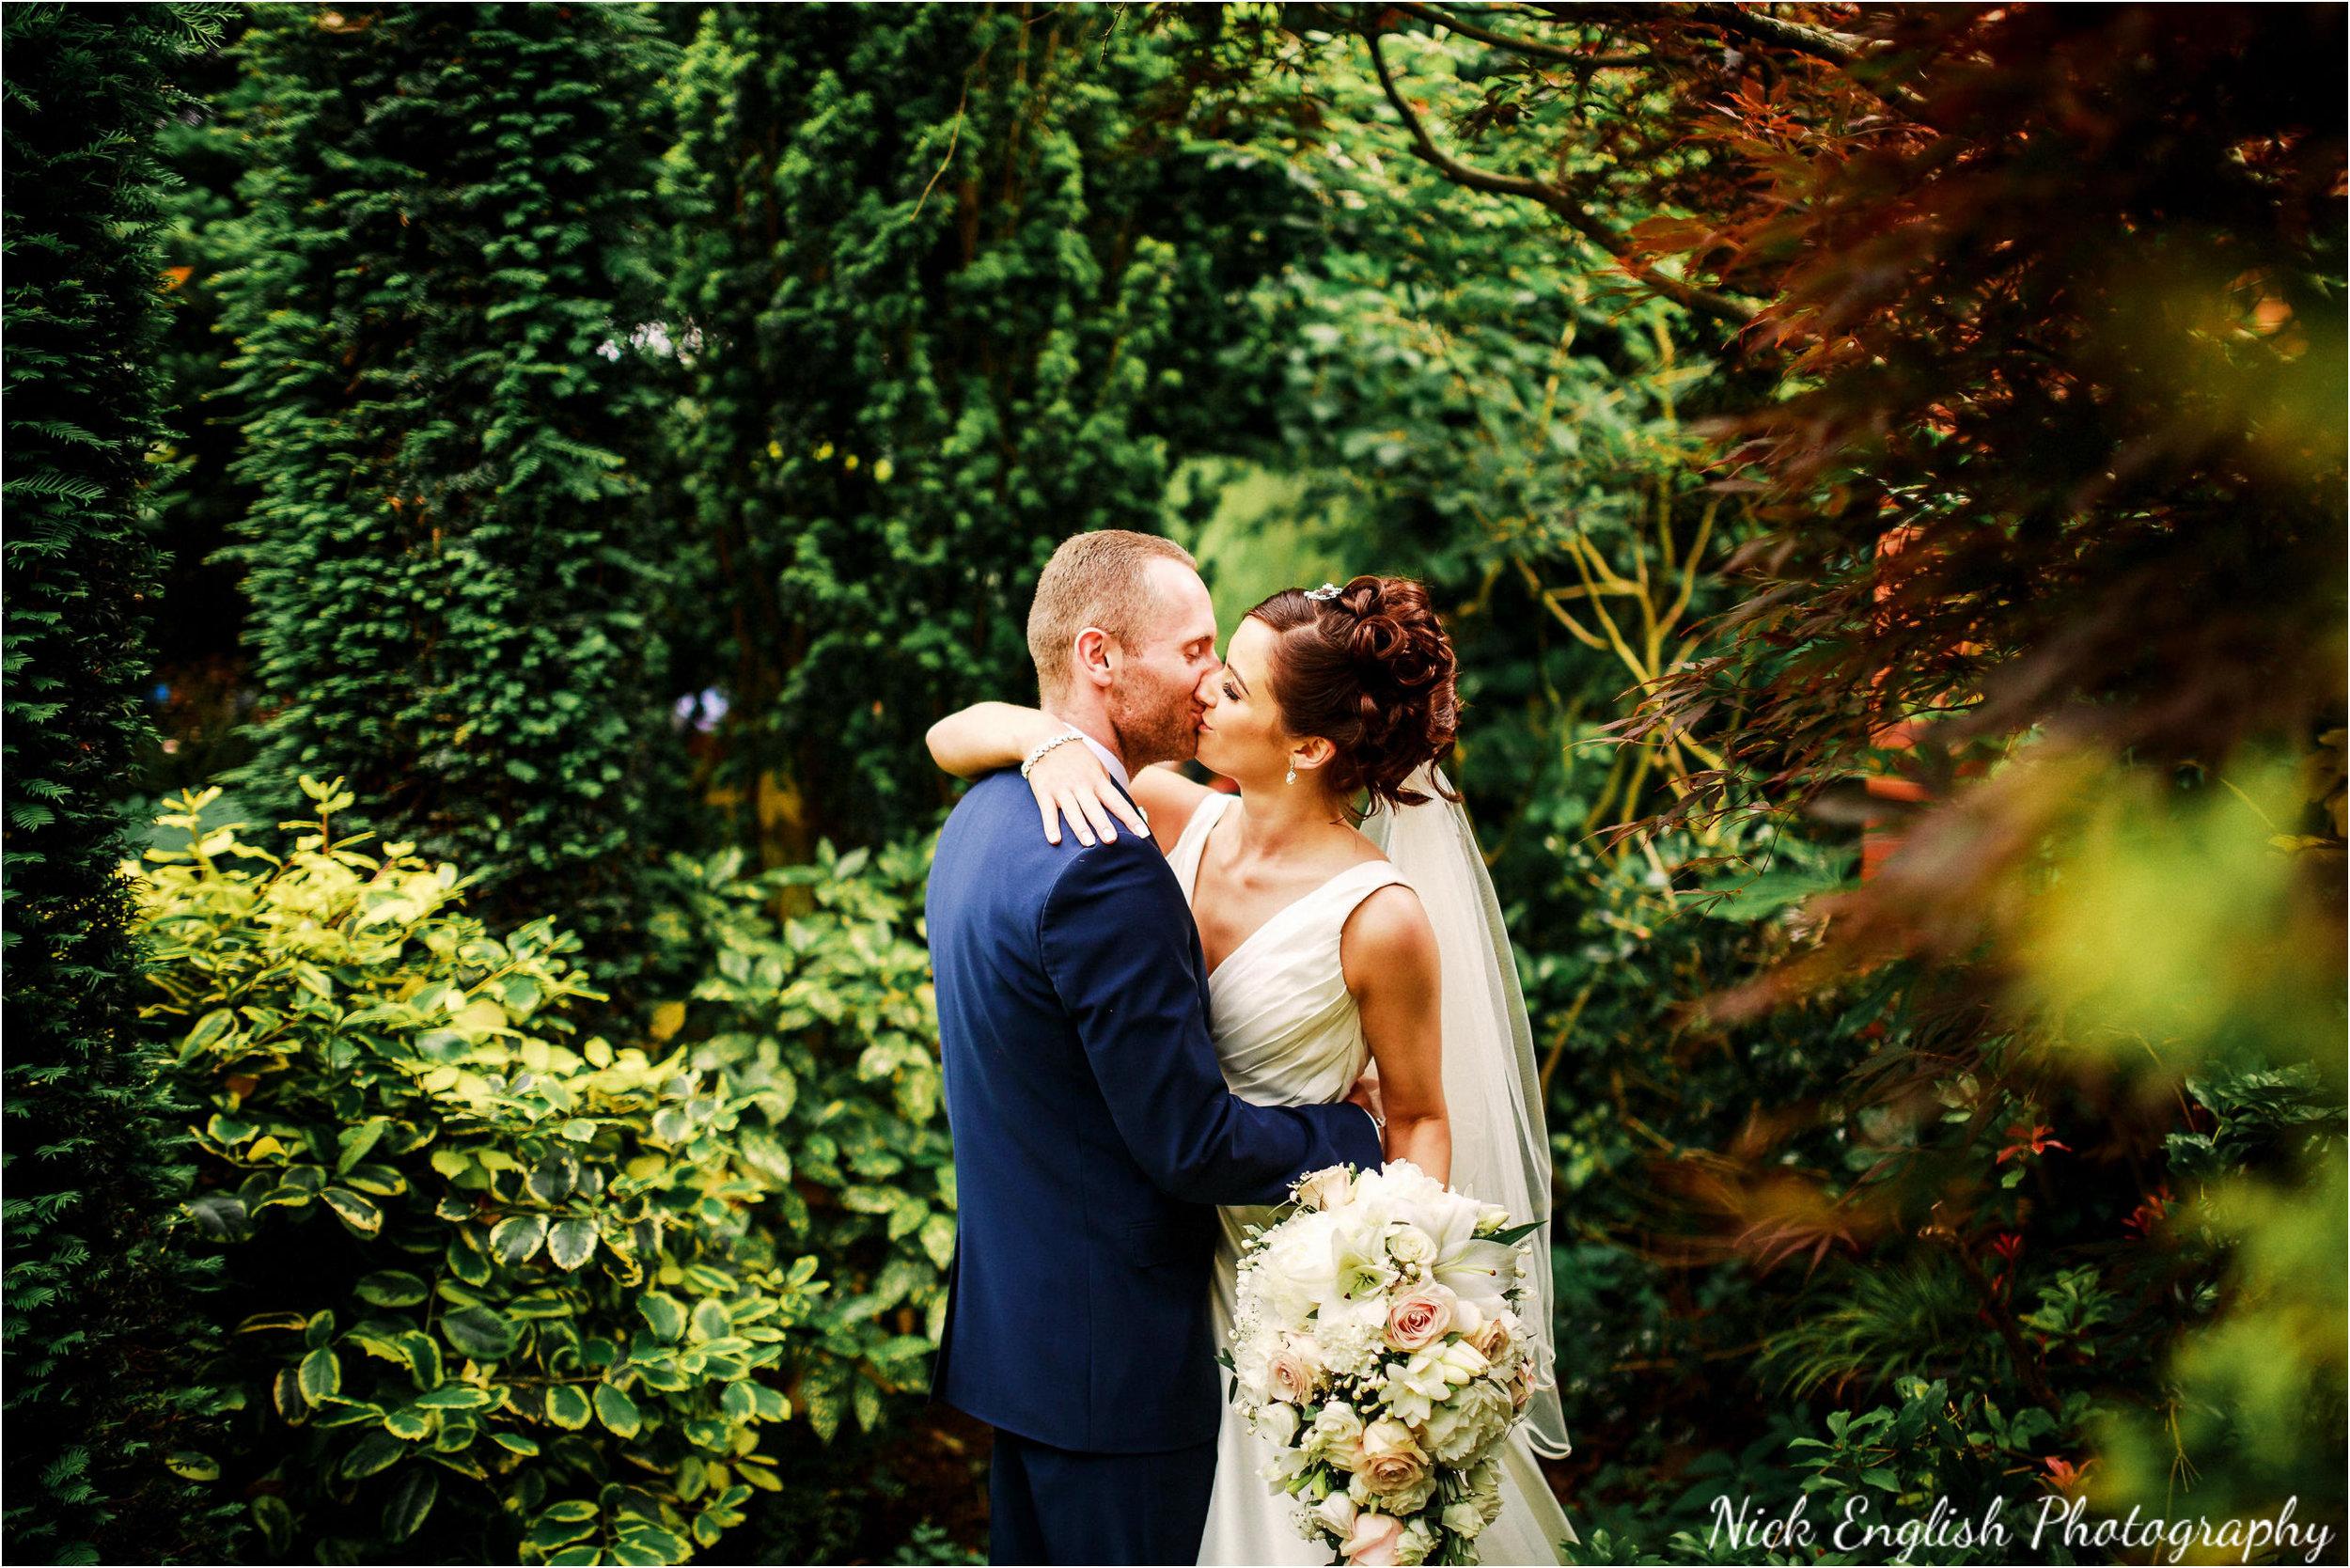 Emily David Wedding Photographs at Barton Grange Preston by Nick English Photography 144jpg.jpeg